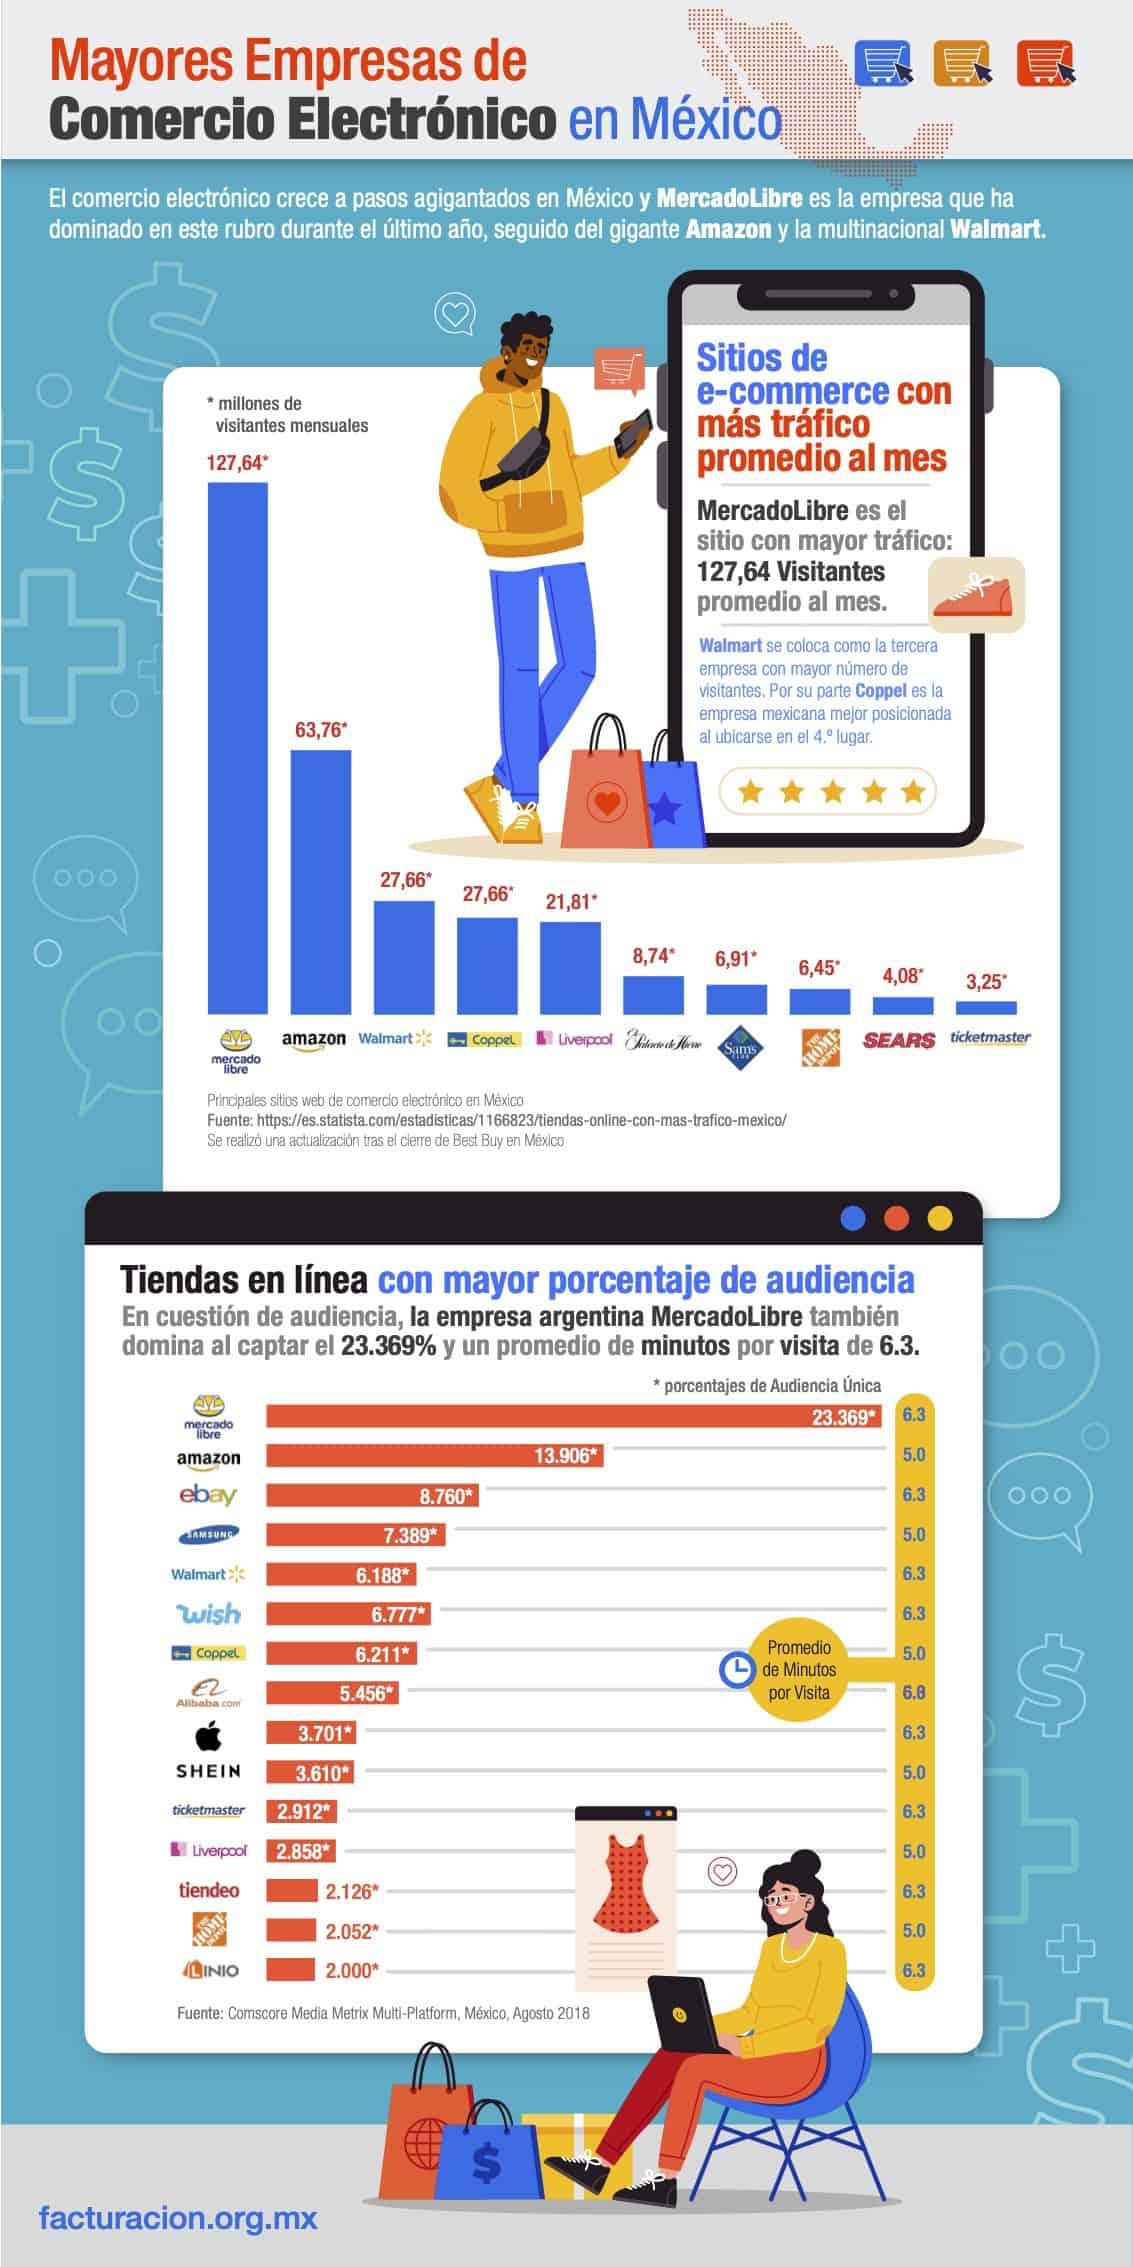 empresas de ecommerce más importantes de México